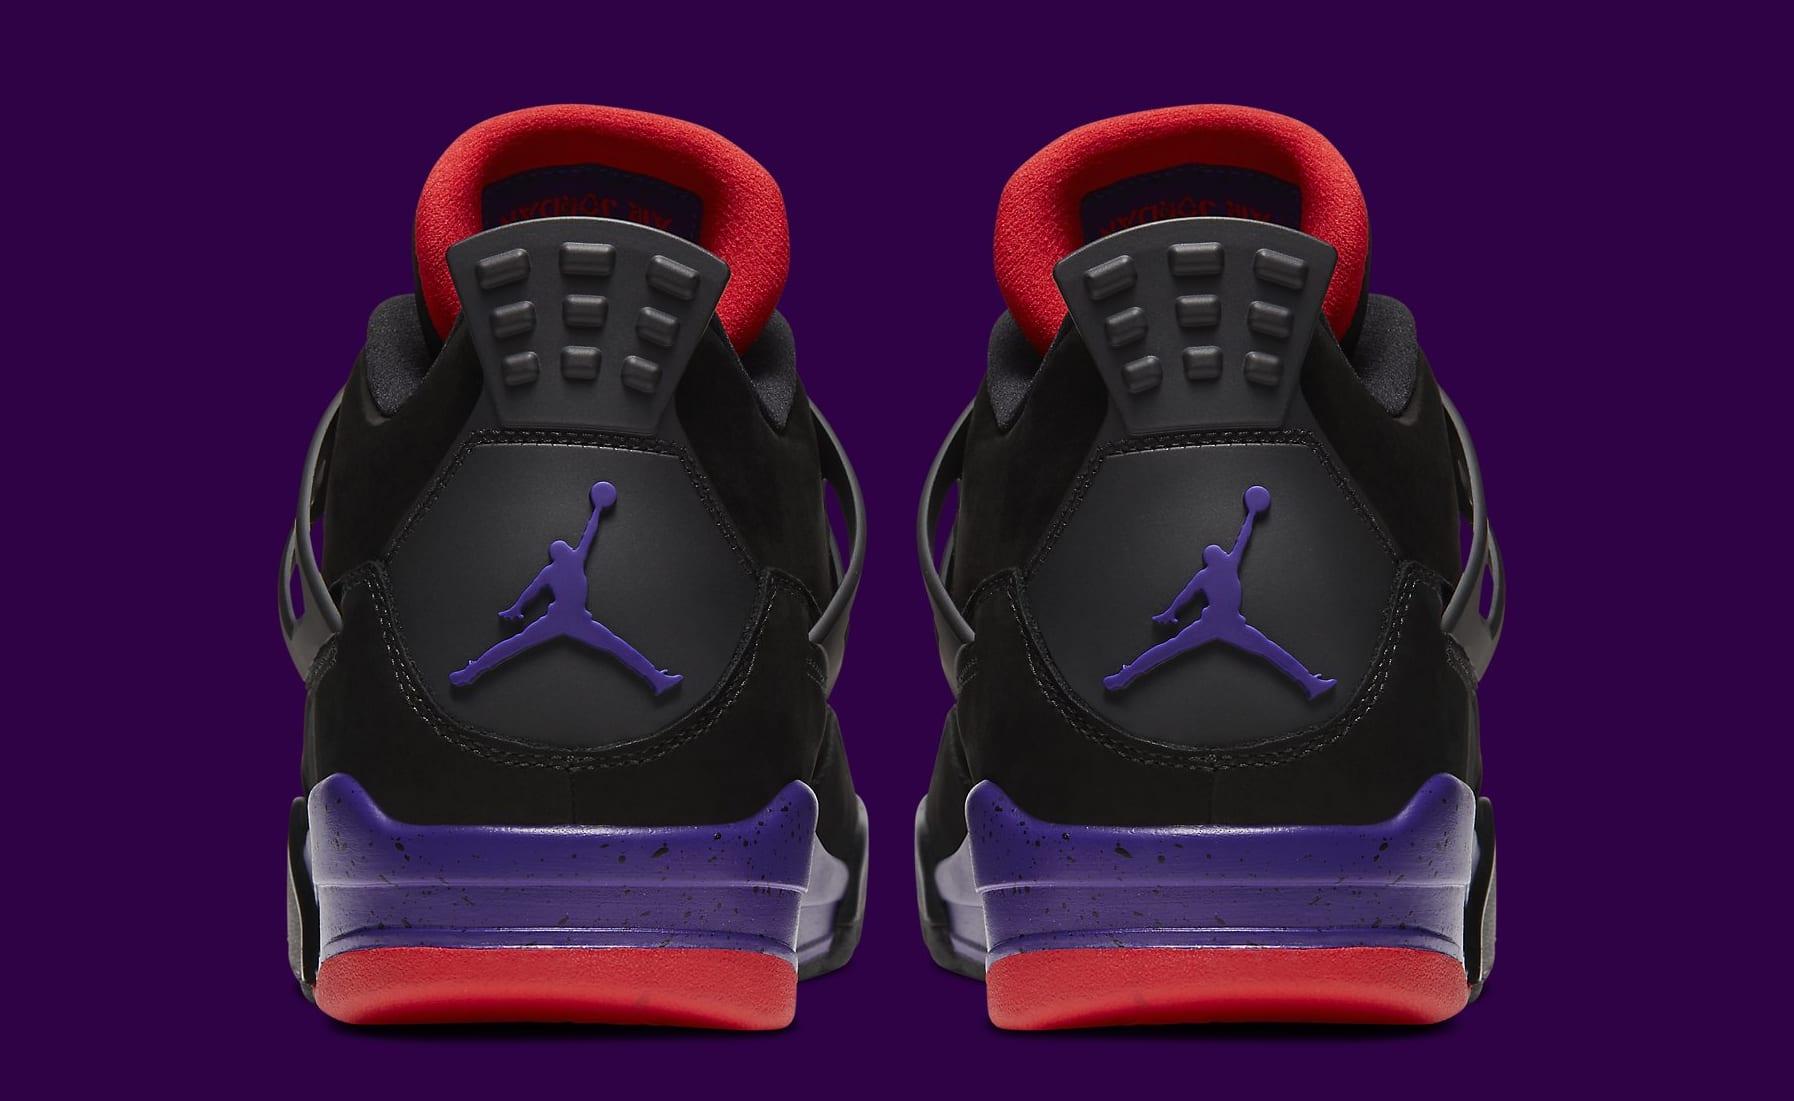 Air Jordan 4 Retro 'Raptors' AQ3816-056 Heel